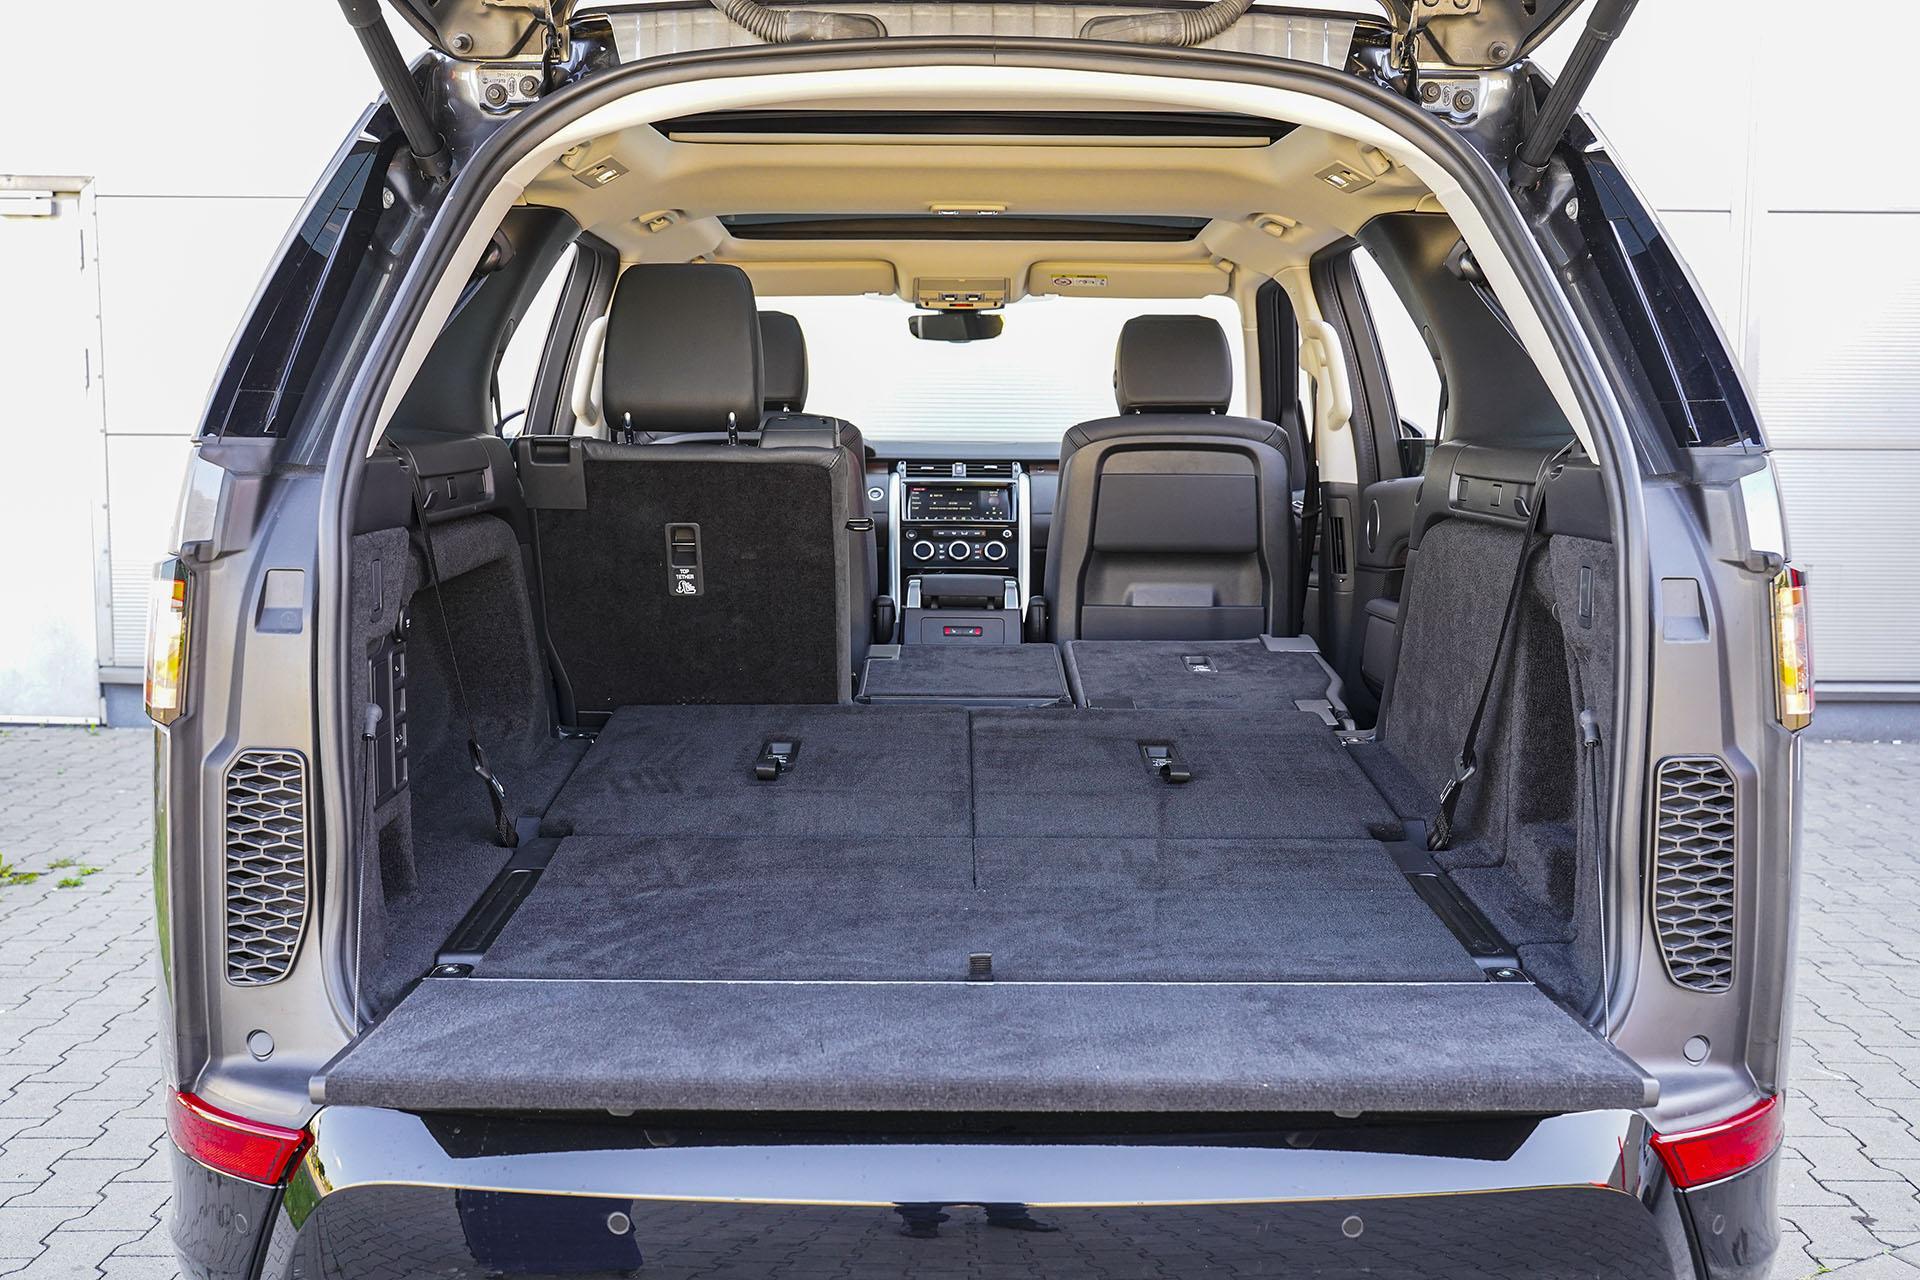 Land Rover Discovery - bagażnik - Land Rover Discovery, Mercedes GLE, Range Rover Sport, Volkswagen Touareg, Volvo XC90 – PORÓWNANIE –opinie, dane techniczne, wymiary